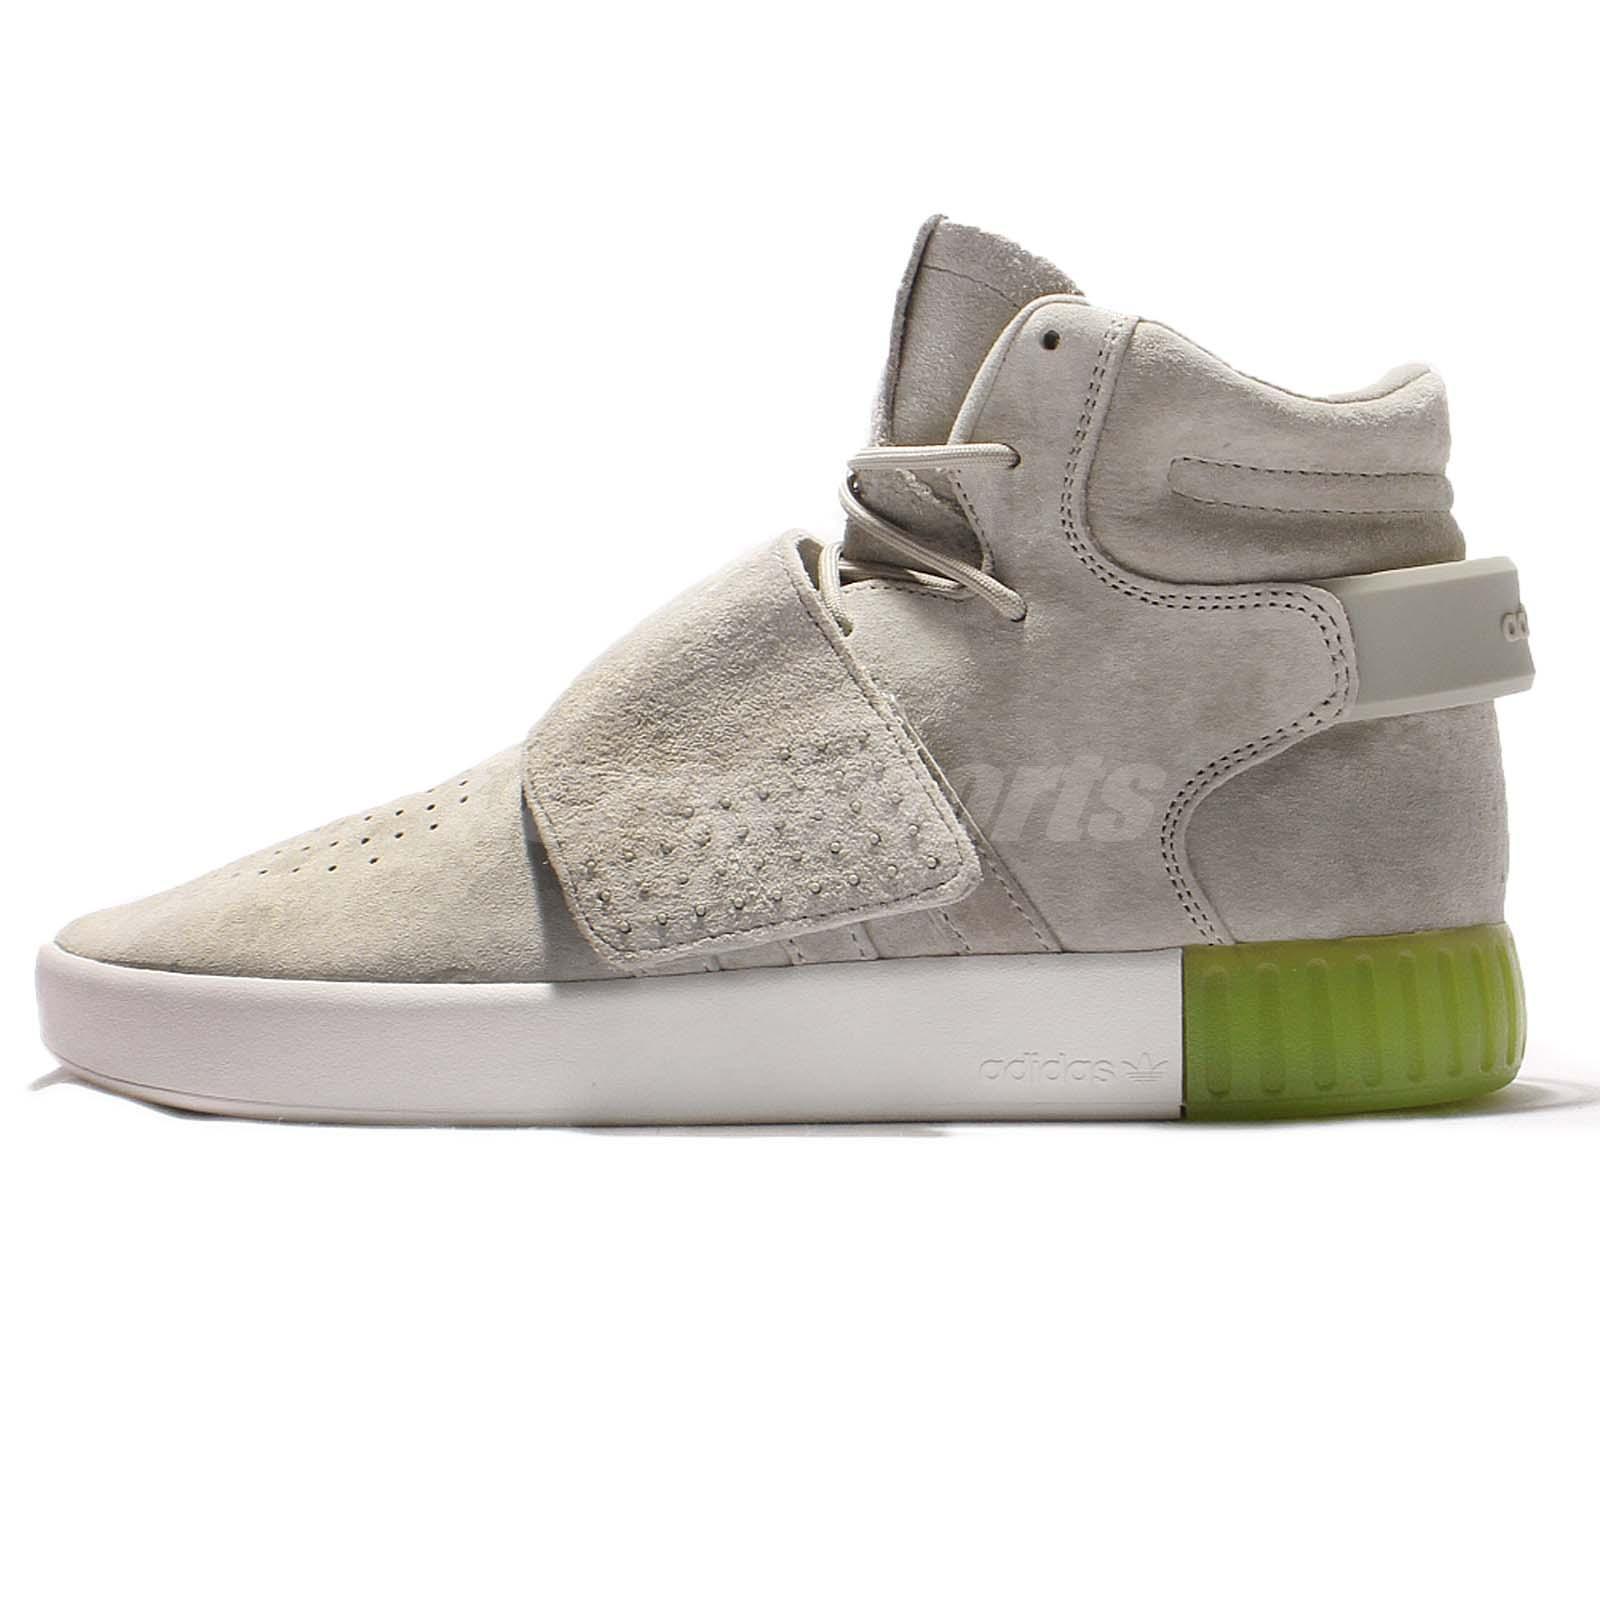 Adidas Tubular Invader Yeezy